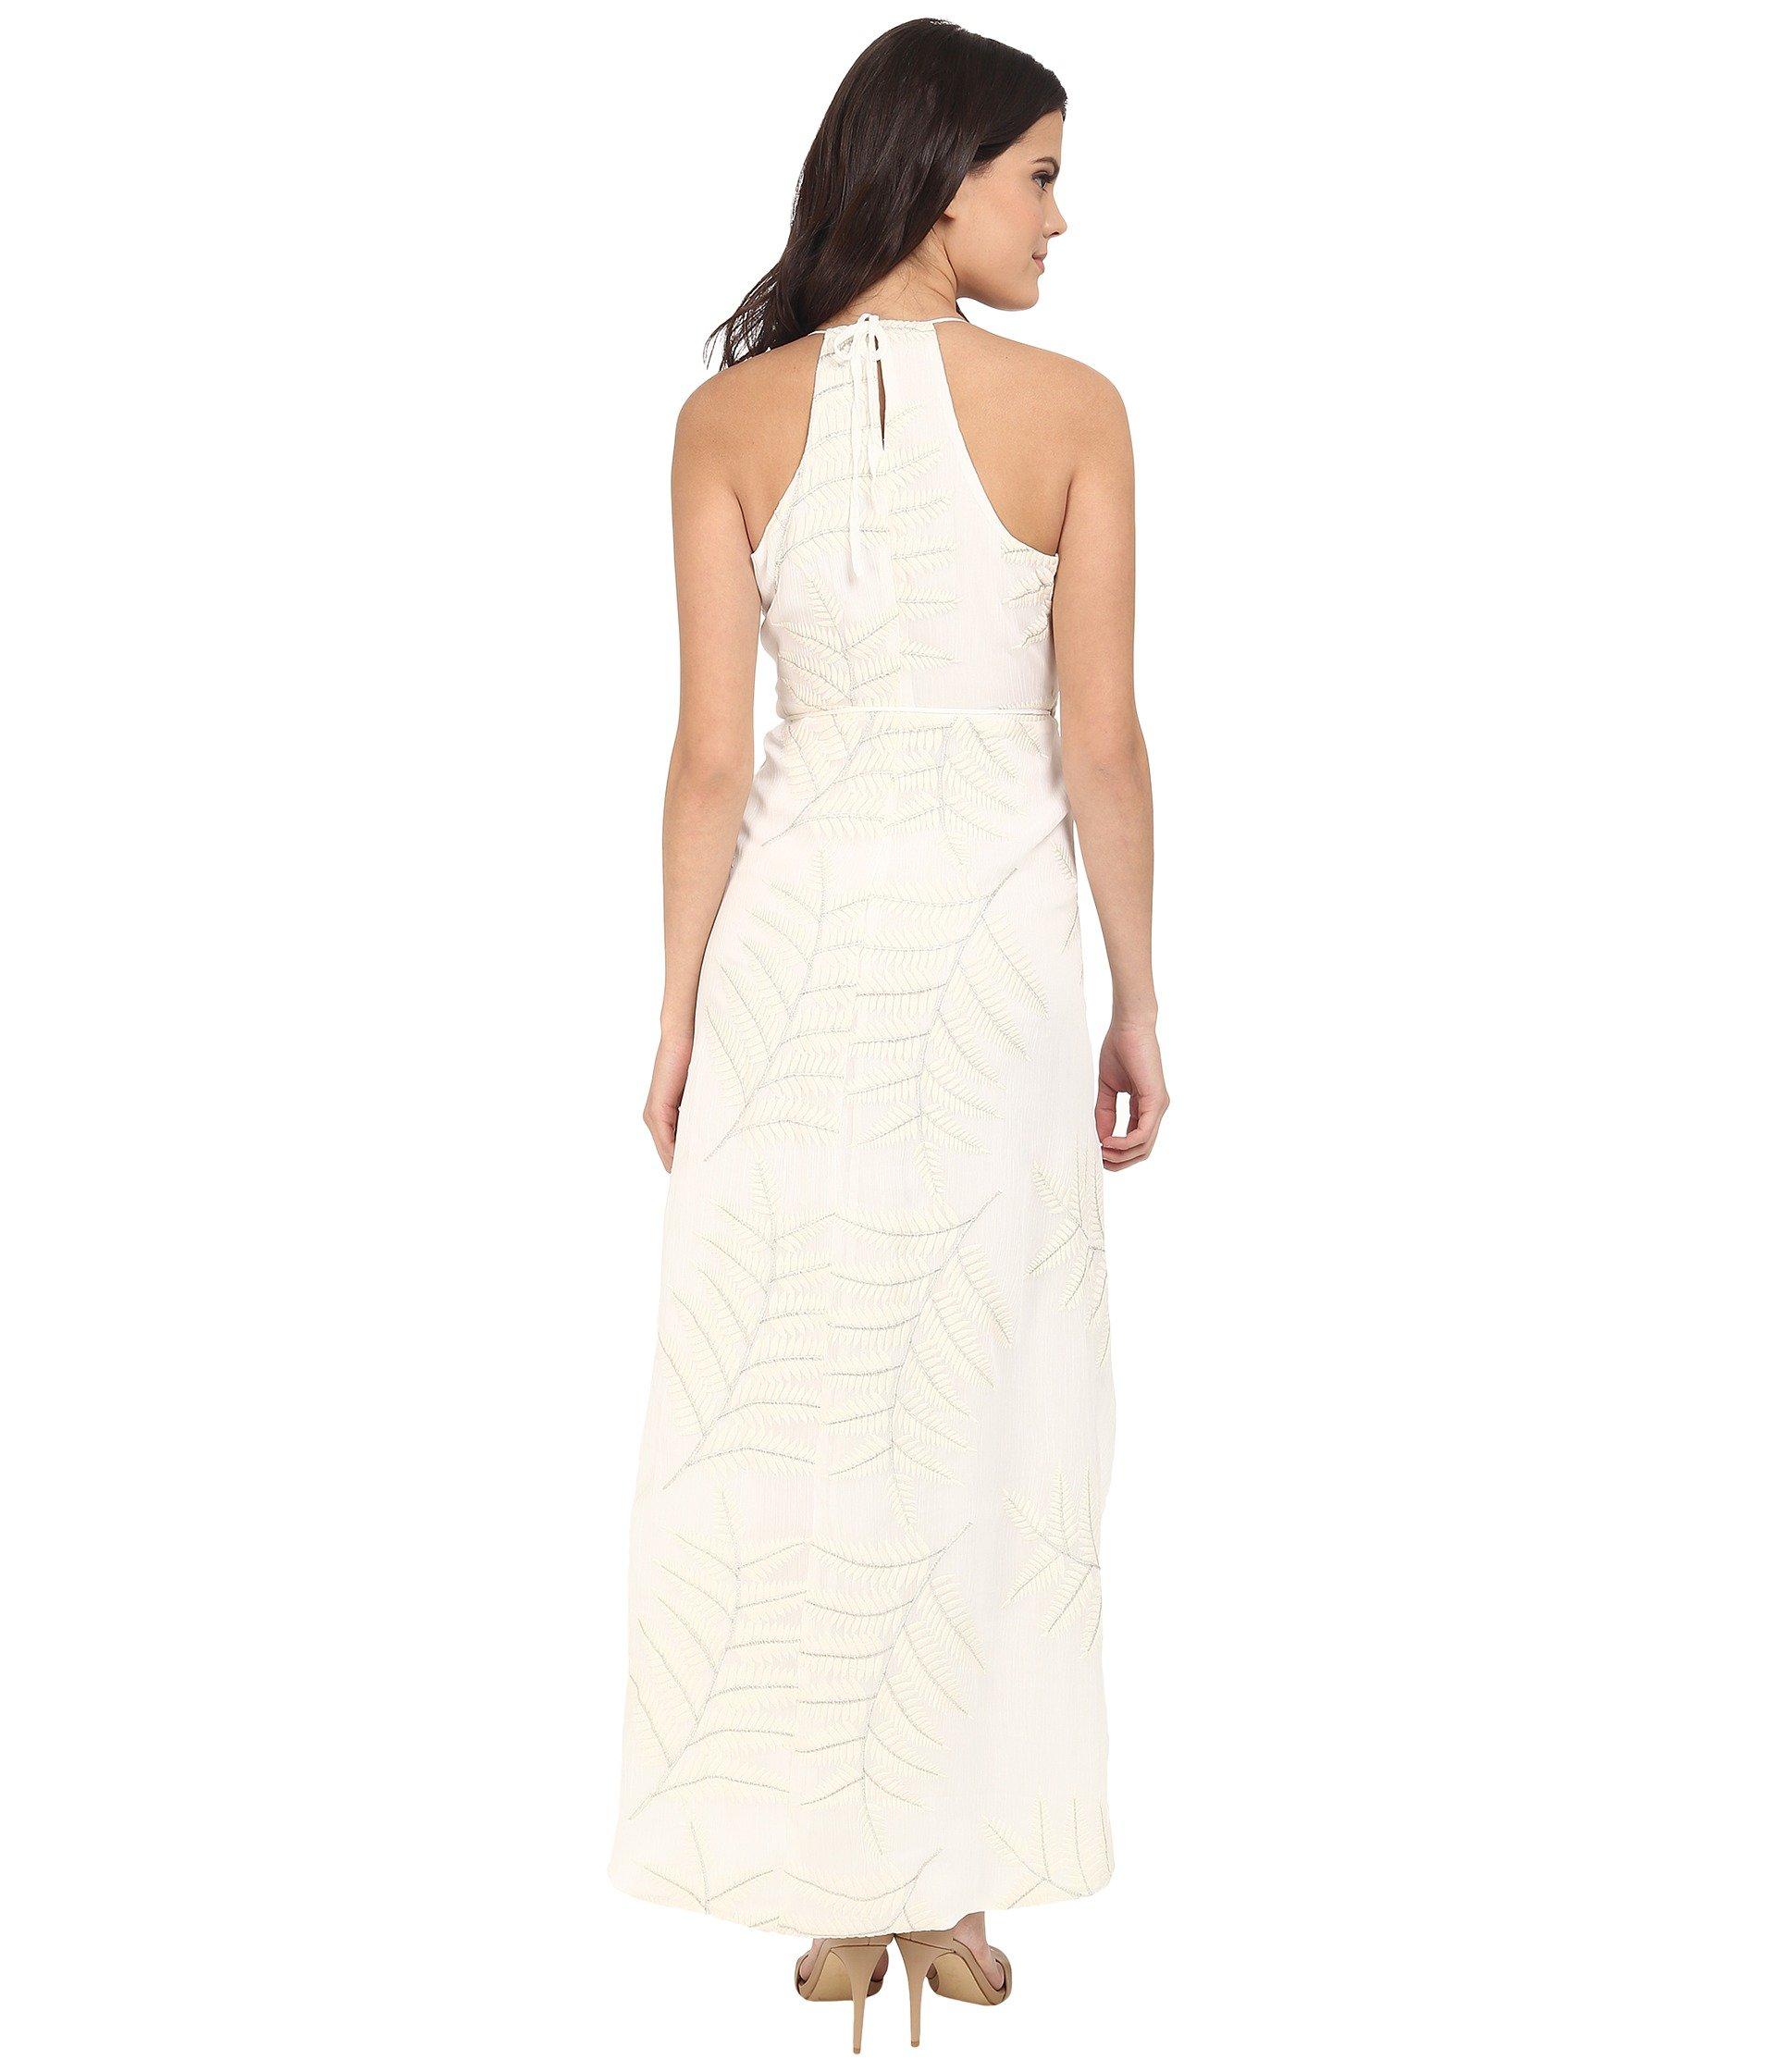 1ee7cb329b6e Lovers + Friends Nostalgia Maxi Dress in White - Lyst